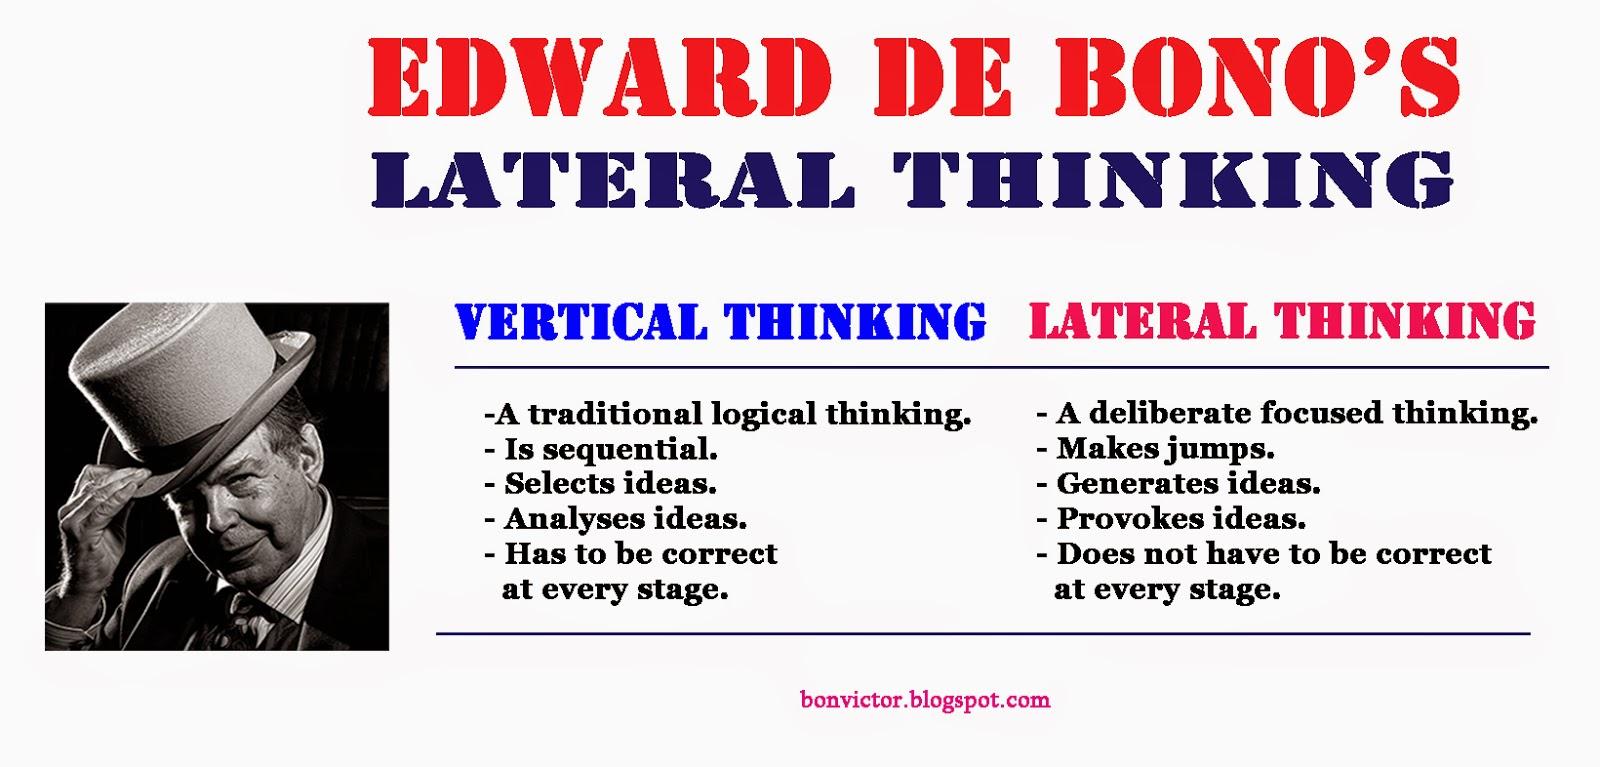 EDWARD DE BONO LATERAL THINKING EPUB DOWNLOAD